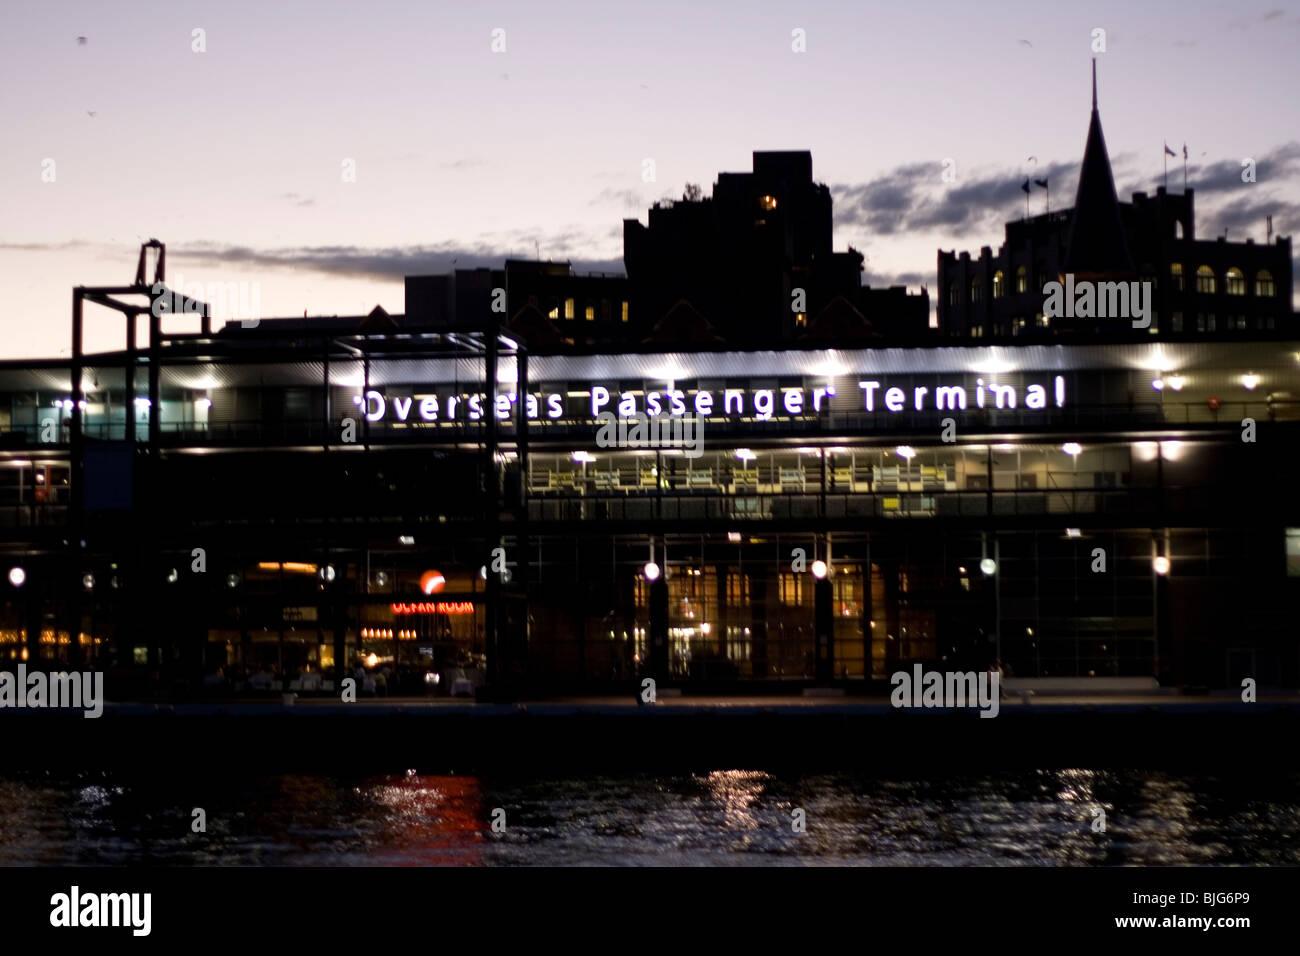 The overseas passenger terminal Circular pier, Sydney, Australia. - Stock Image